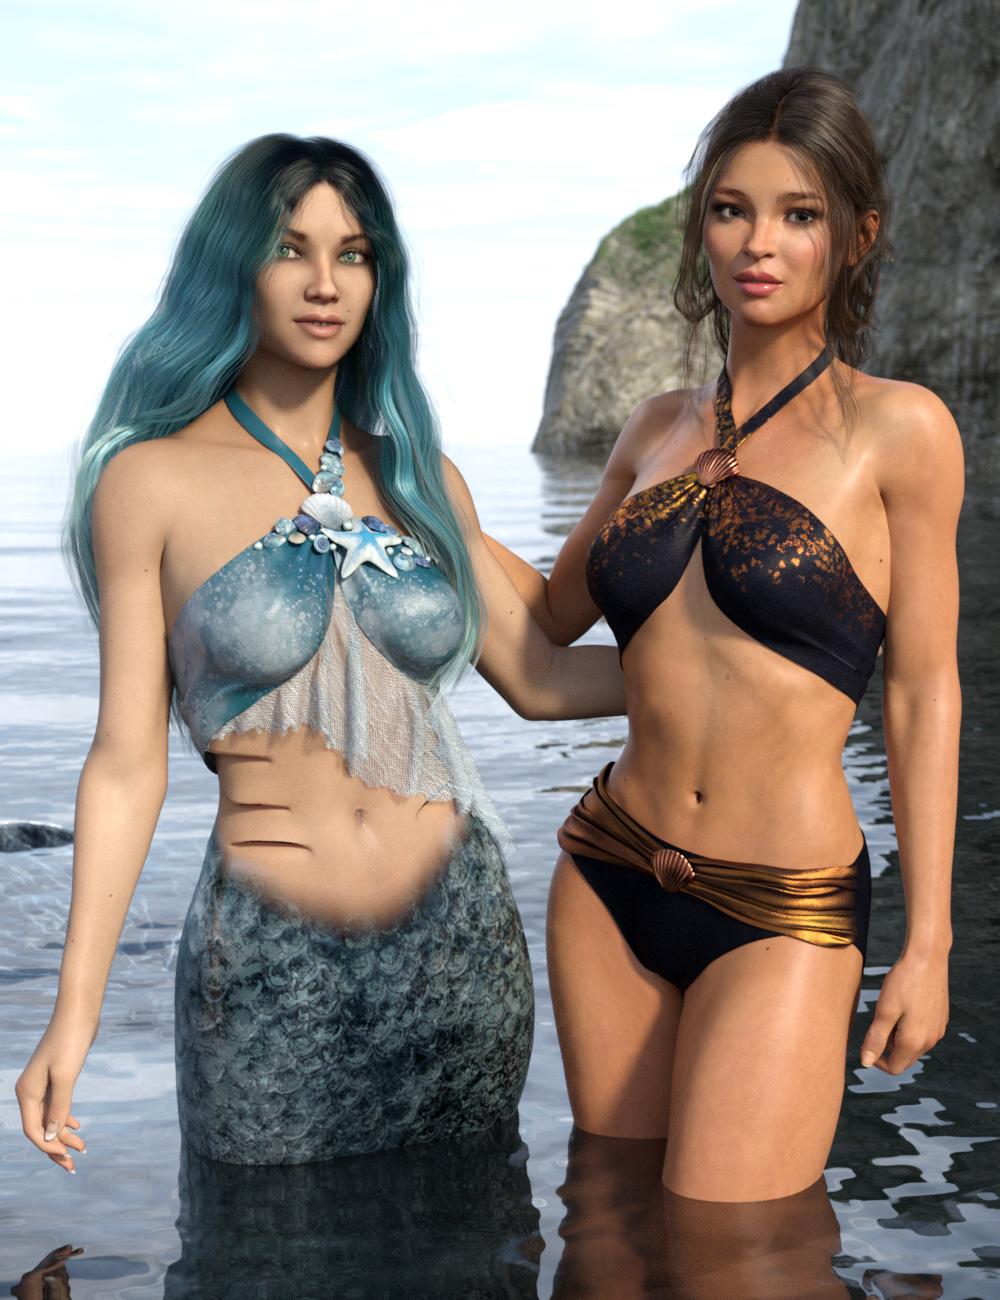 Mermaid Bikini for Genesis 8 and 8.1 Females by: esha, 3D Models by Daz 3D